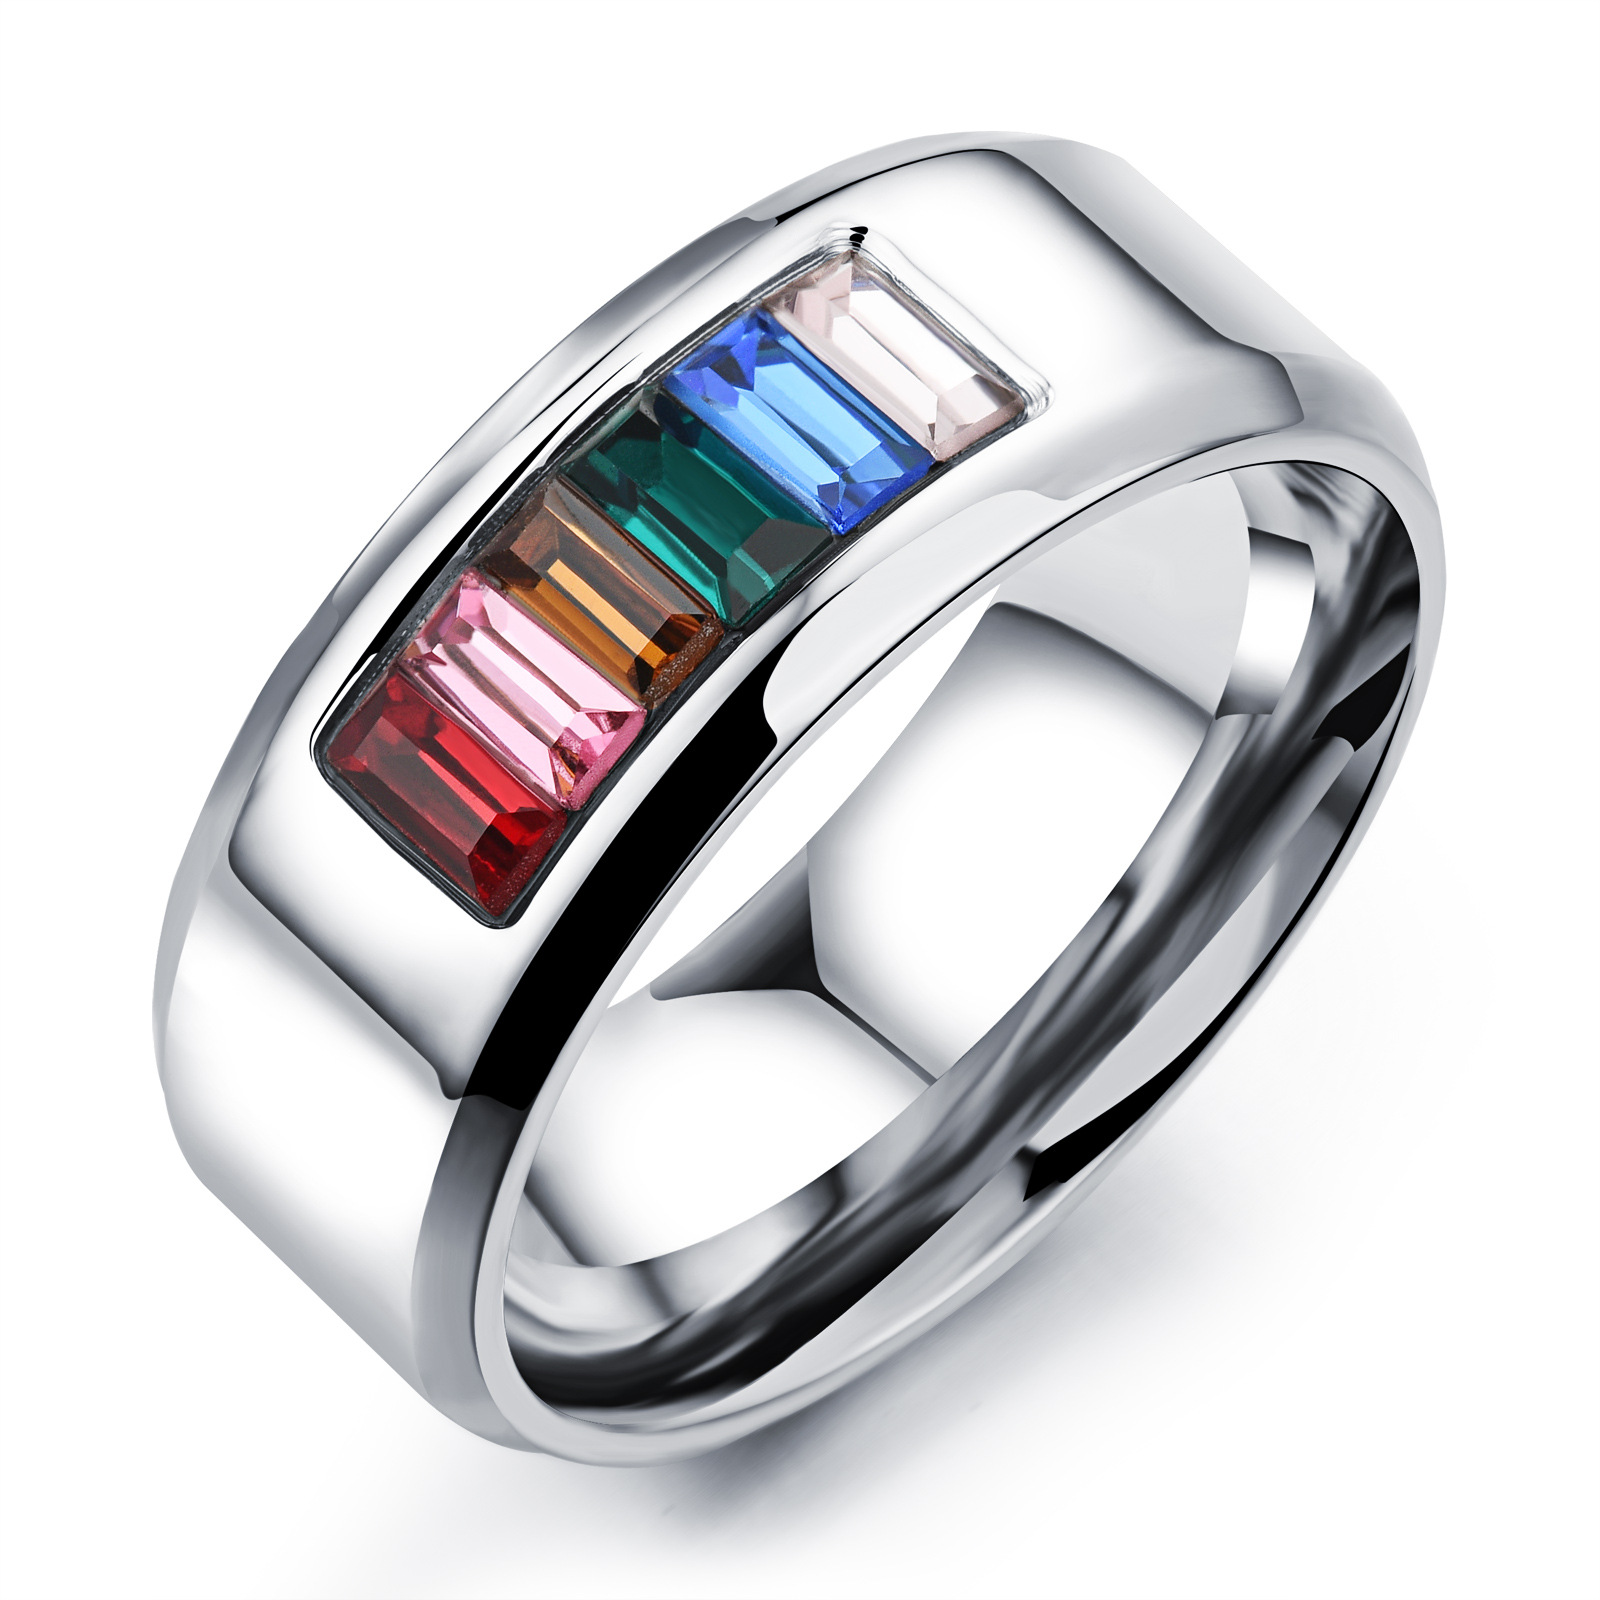 Aliexpress Buy Lesbian Bi ual Gay Pride Homo ual Rings